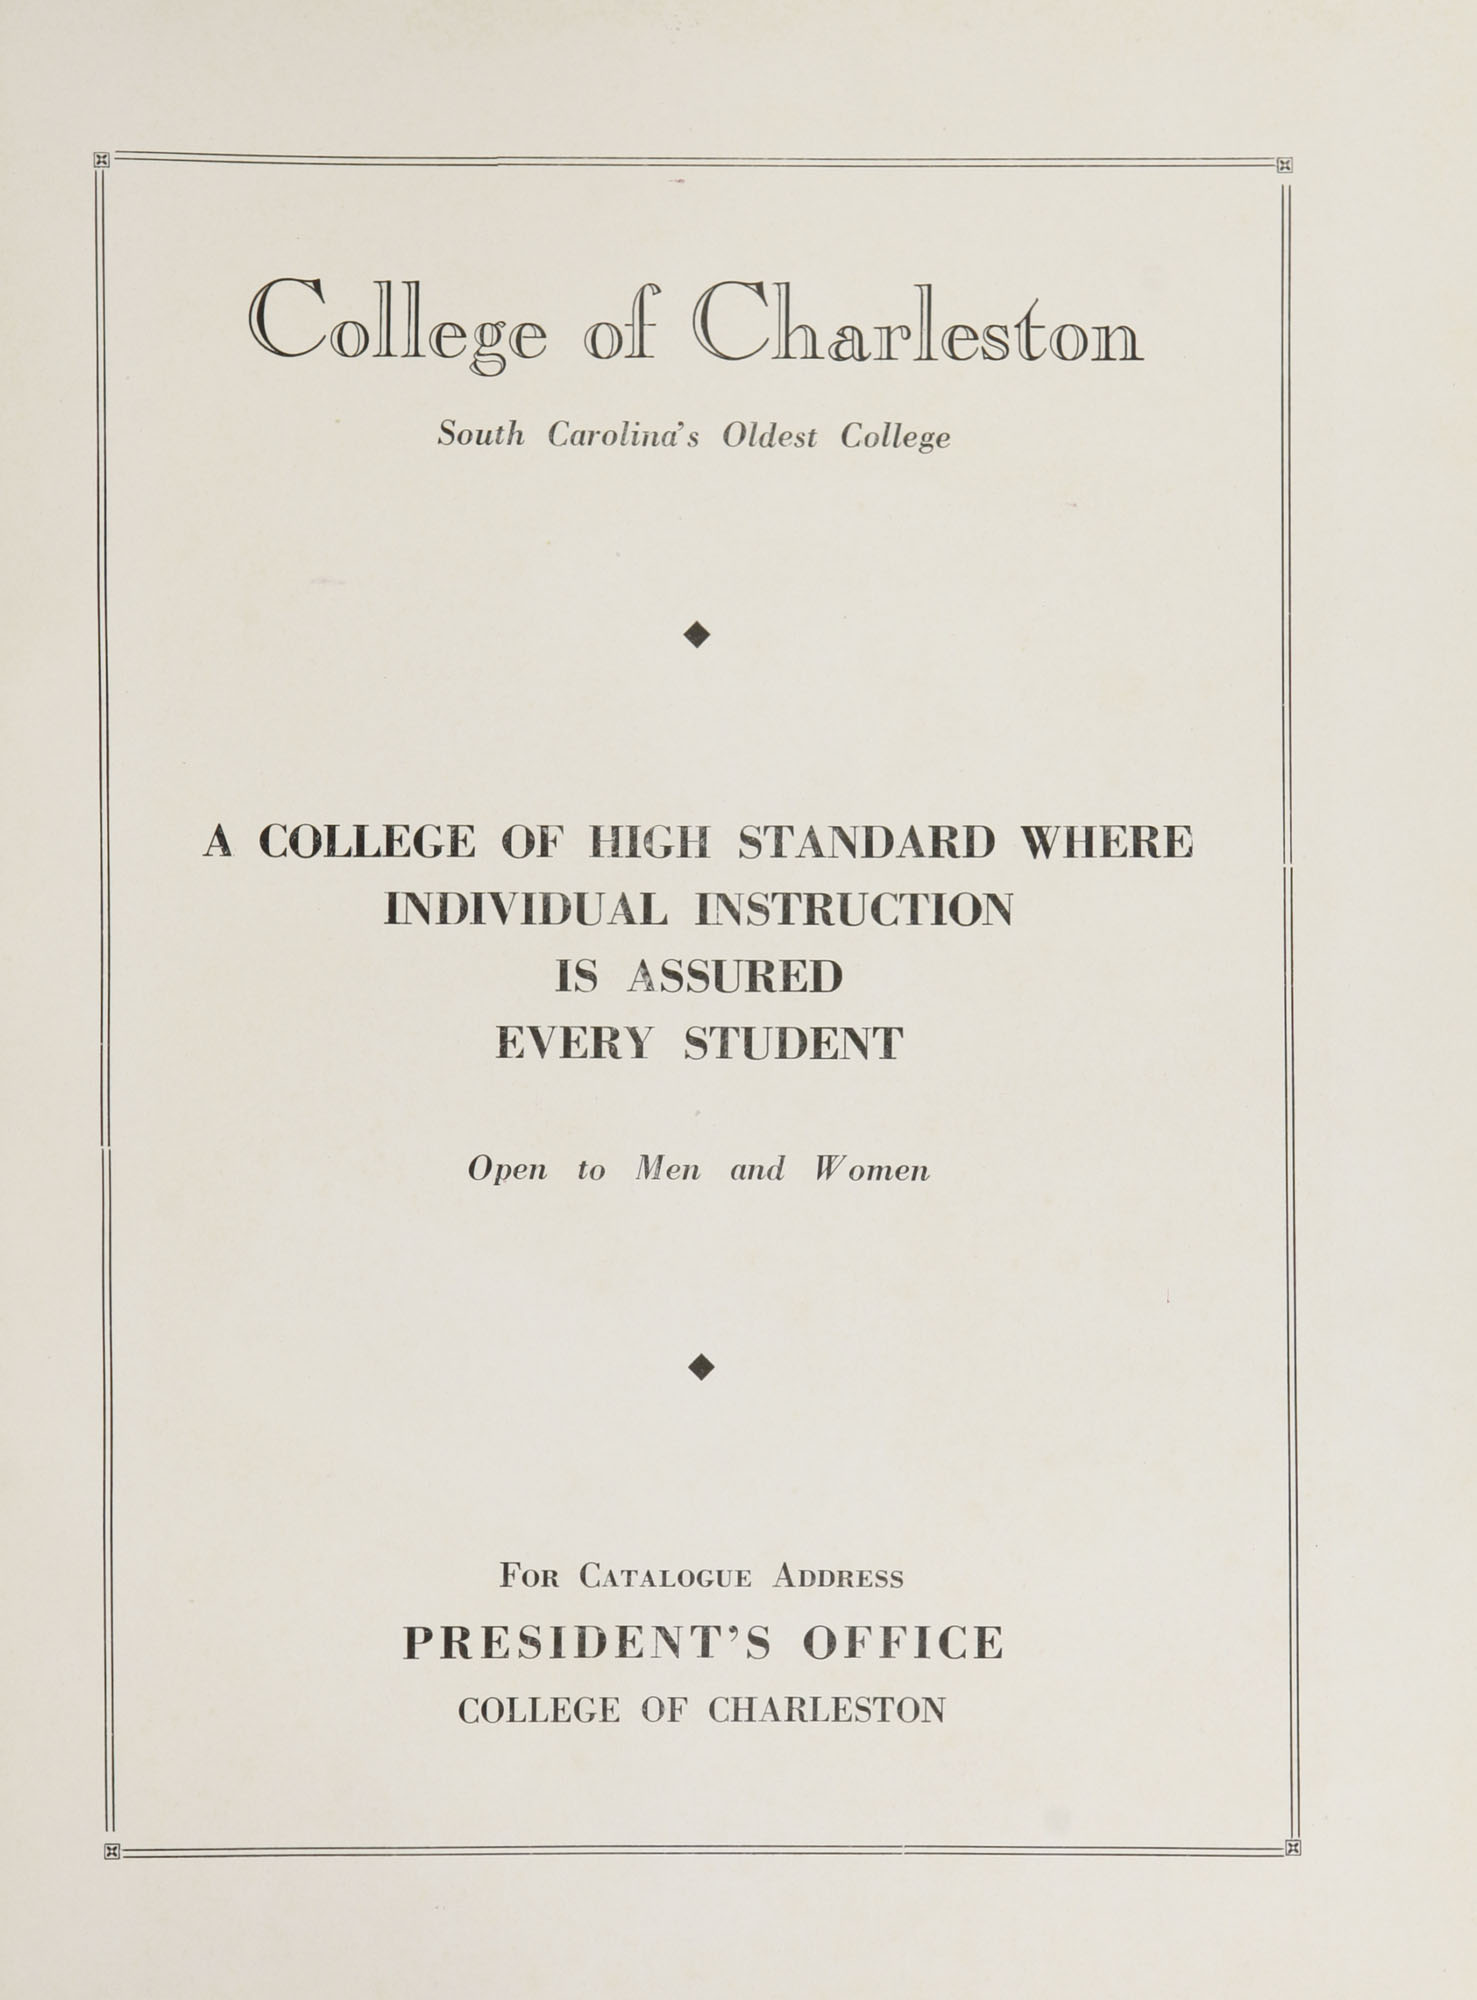 College of Charleston Magazine, 1937-1938, Vol. XXXXI No. 1, advertisement